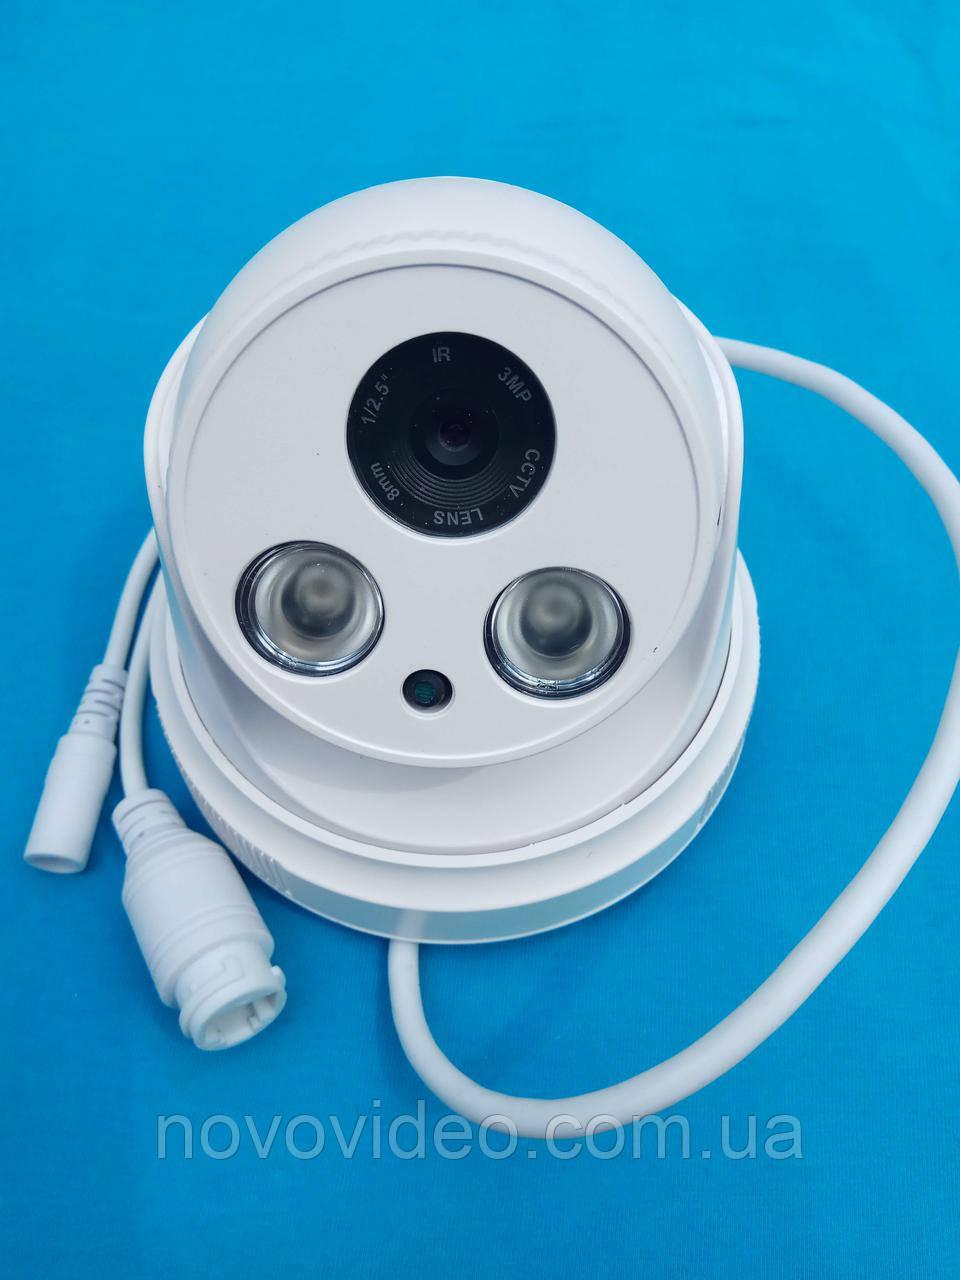 IP камера для помещения HCR 612 на 2 Мегапикселя